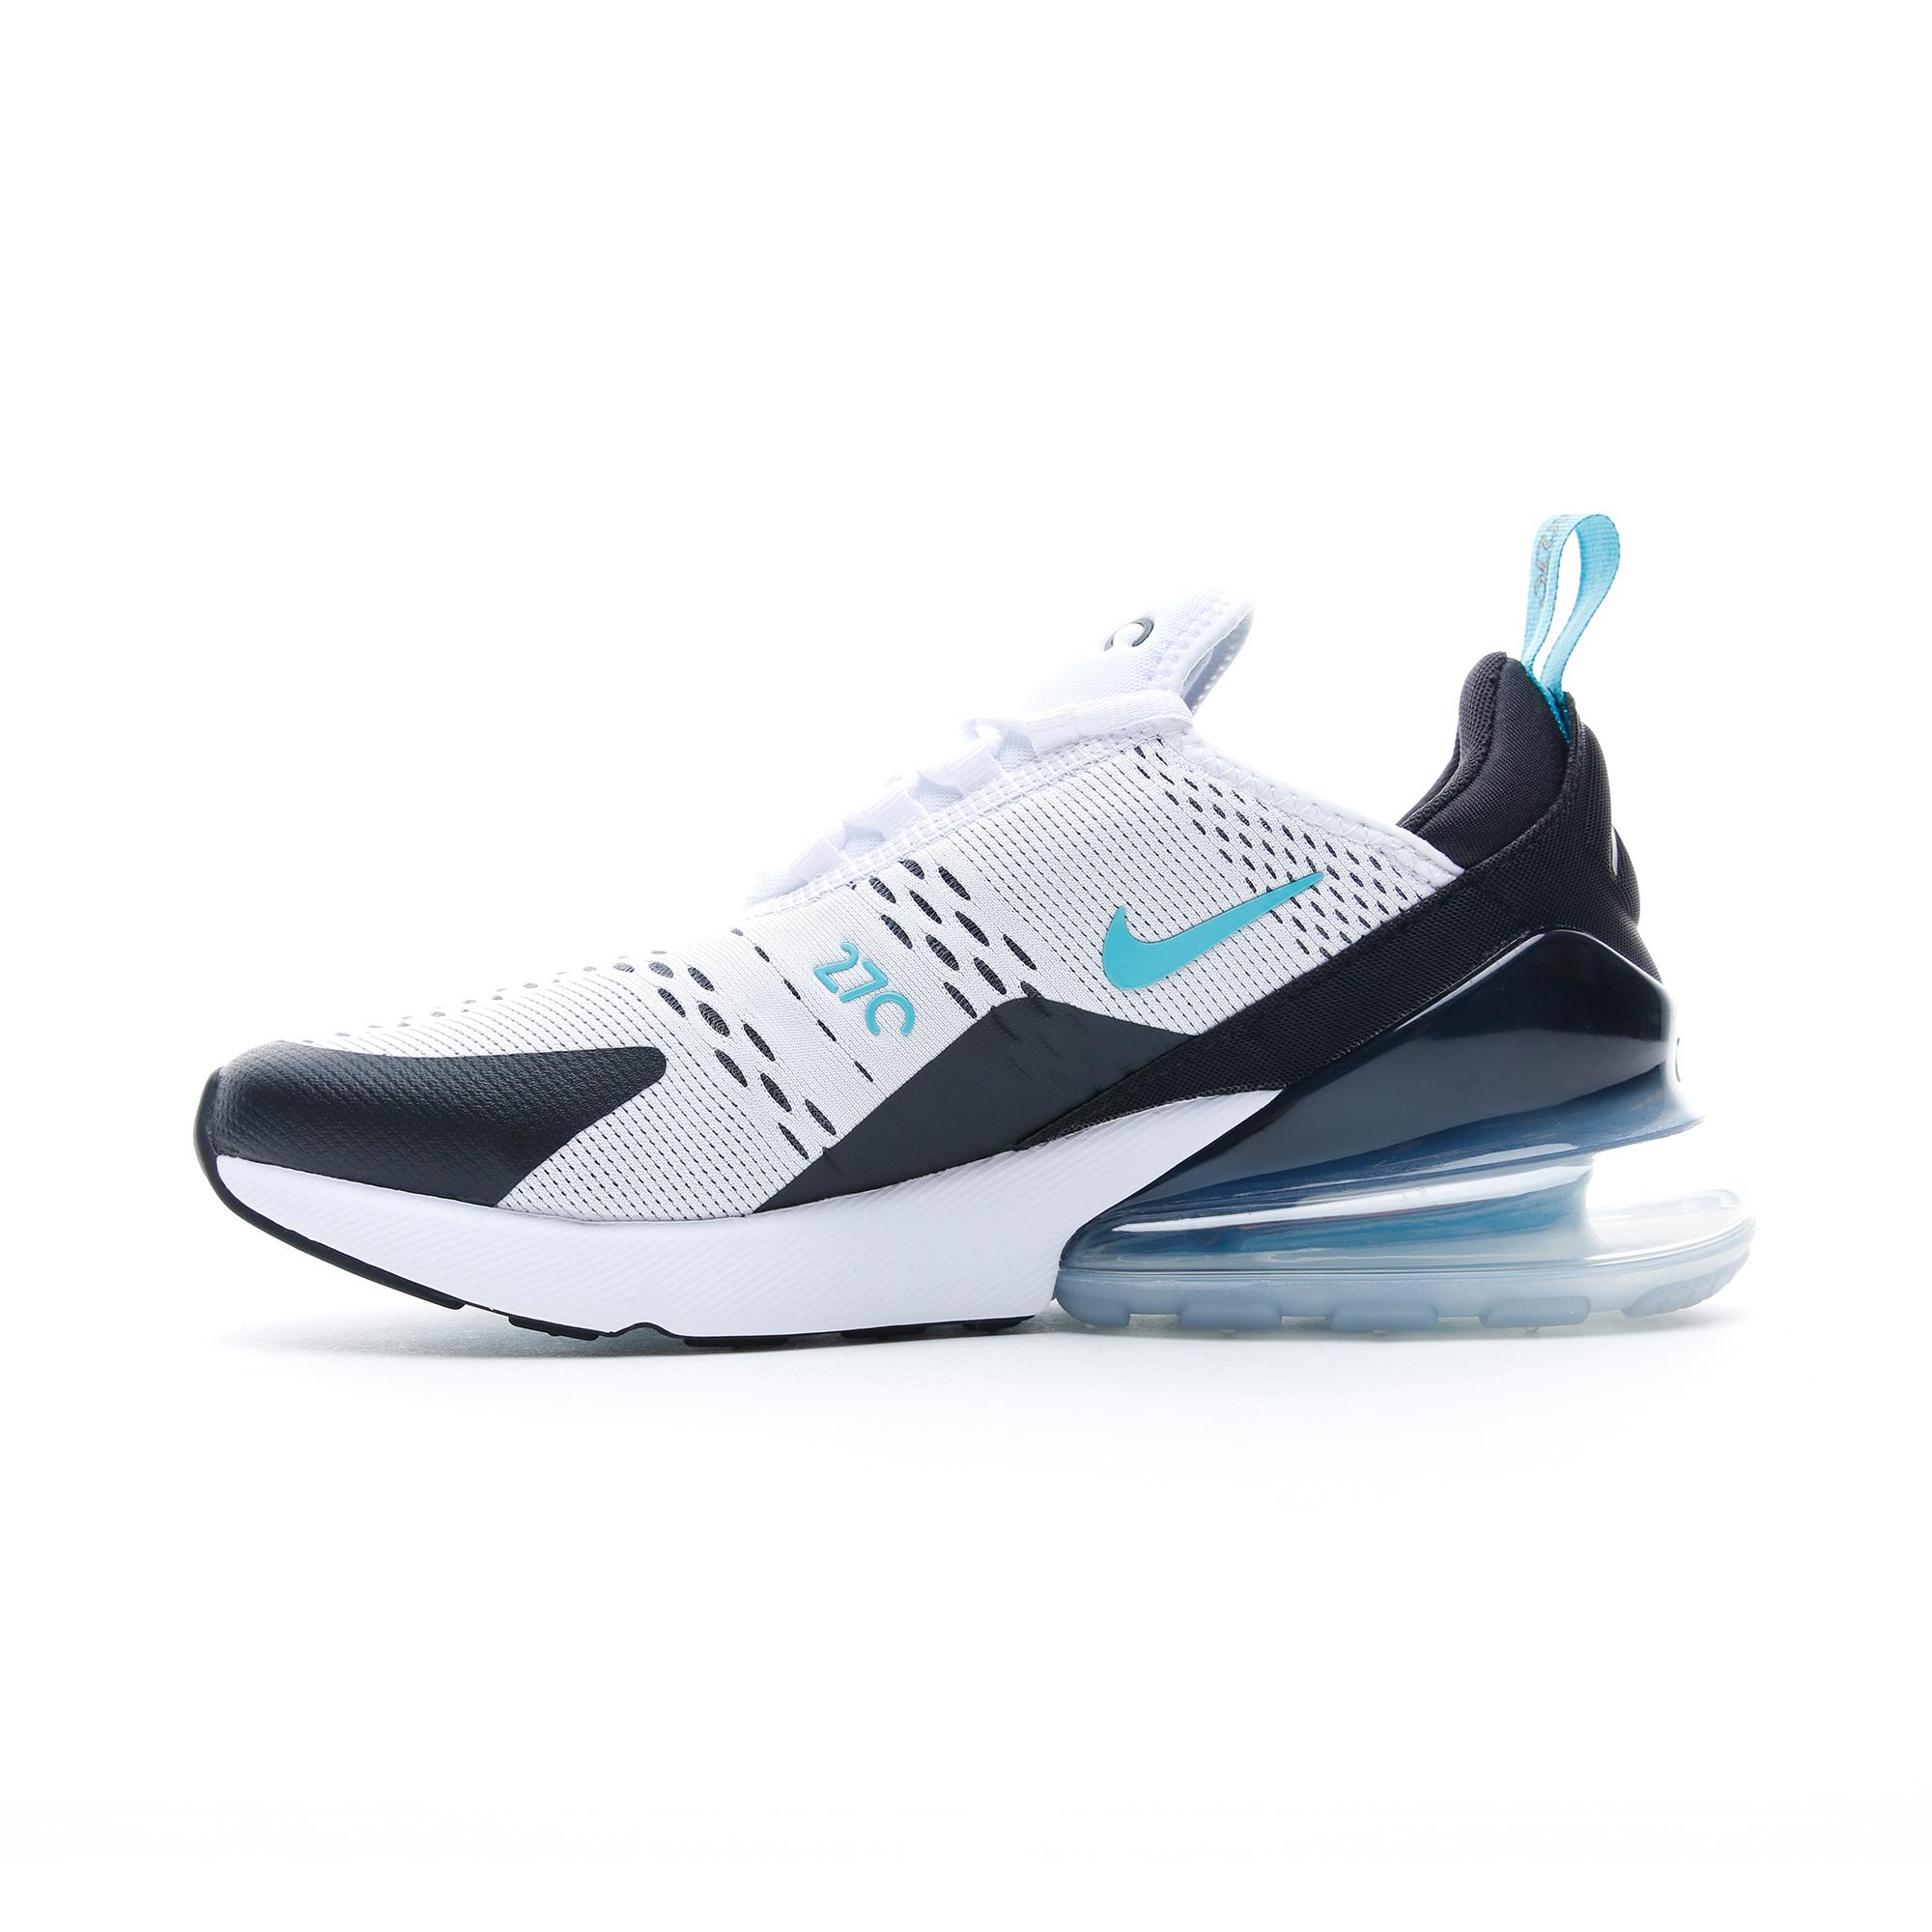 Nike Air Max 270 Beyaz - Siyah Erkek Spor Ayakkabı